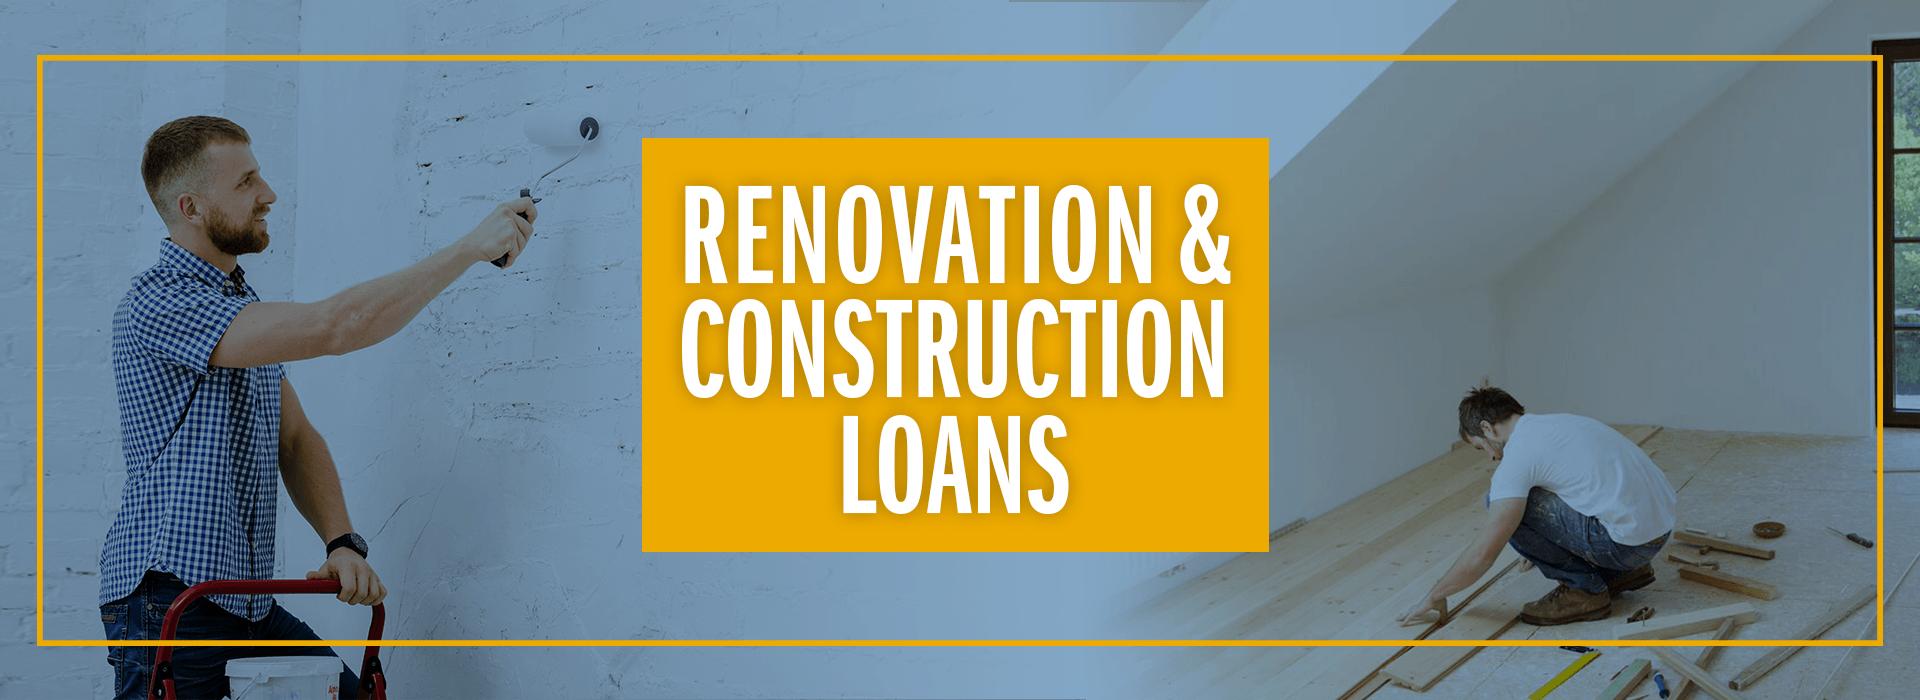 GMFS Mortgage Renovation & Construction Loans